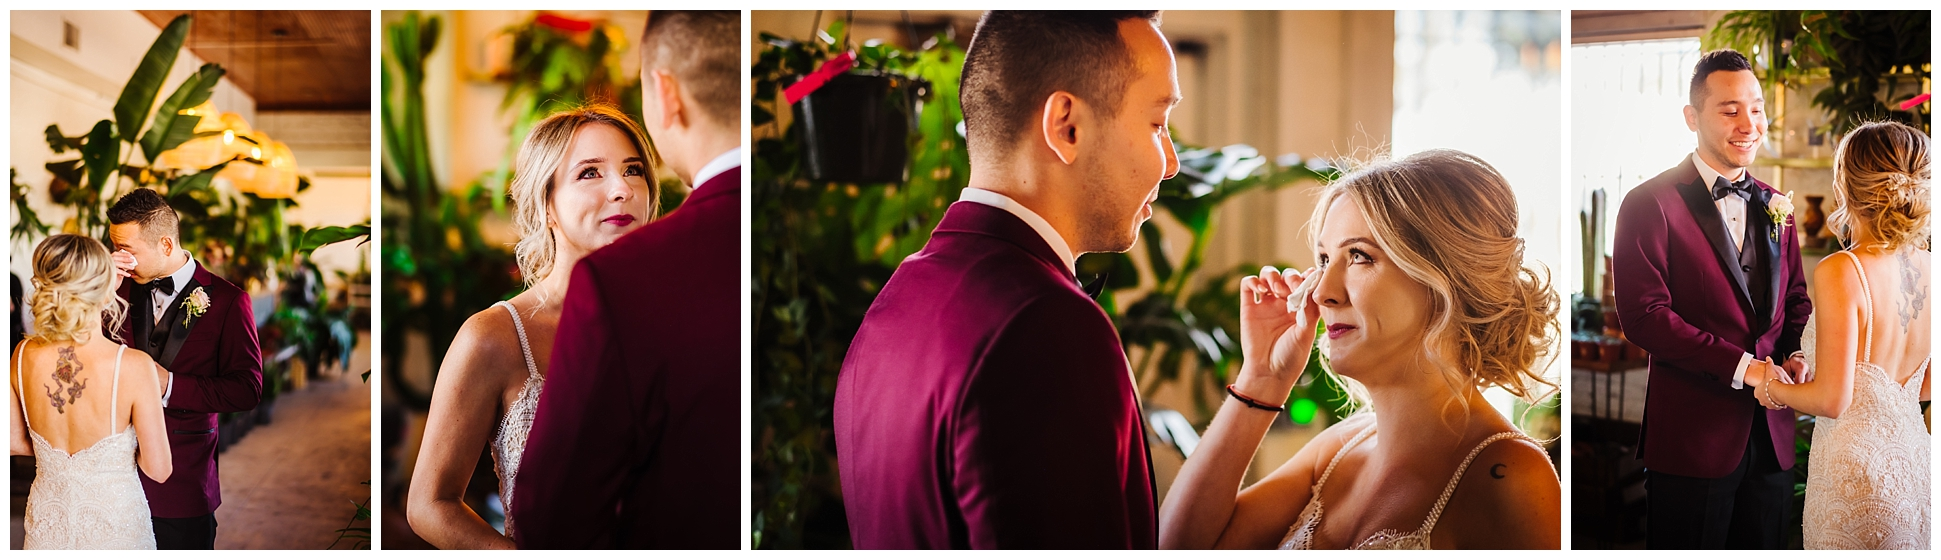 tampa-armeture-wedding-photographer-edgy-industrial-downtown-fancy-free-nursery-tattoo-burgandy-velvet_0024.jpg